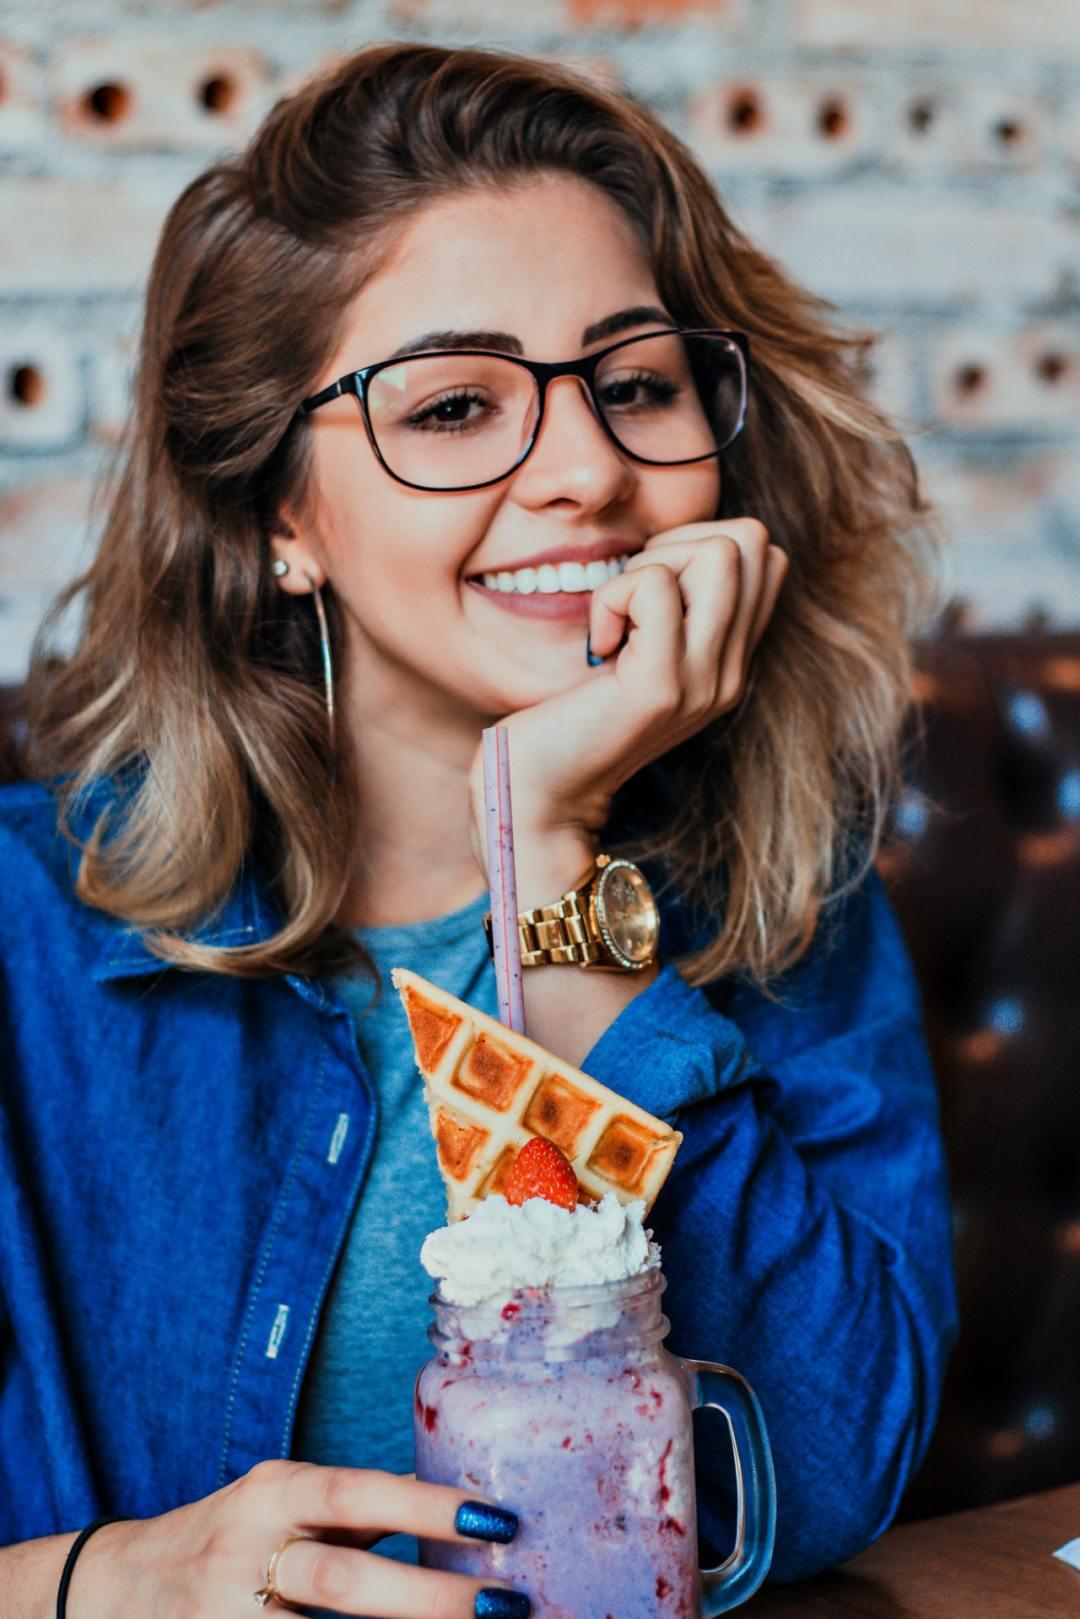 smiling girl having ice cream